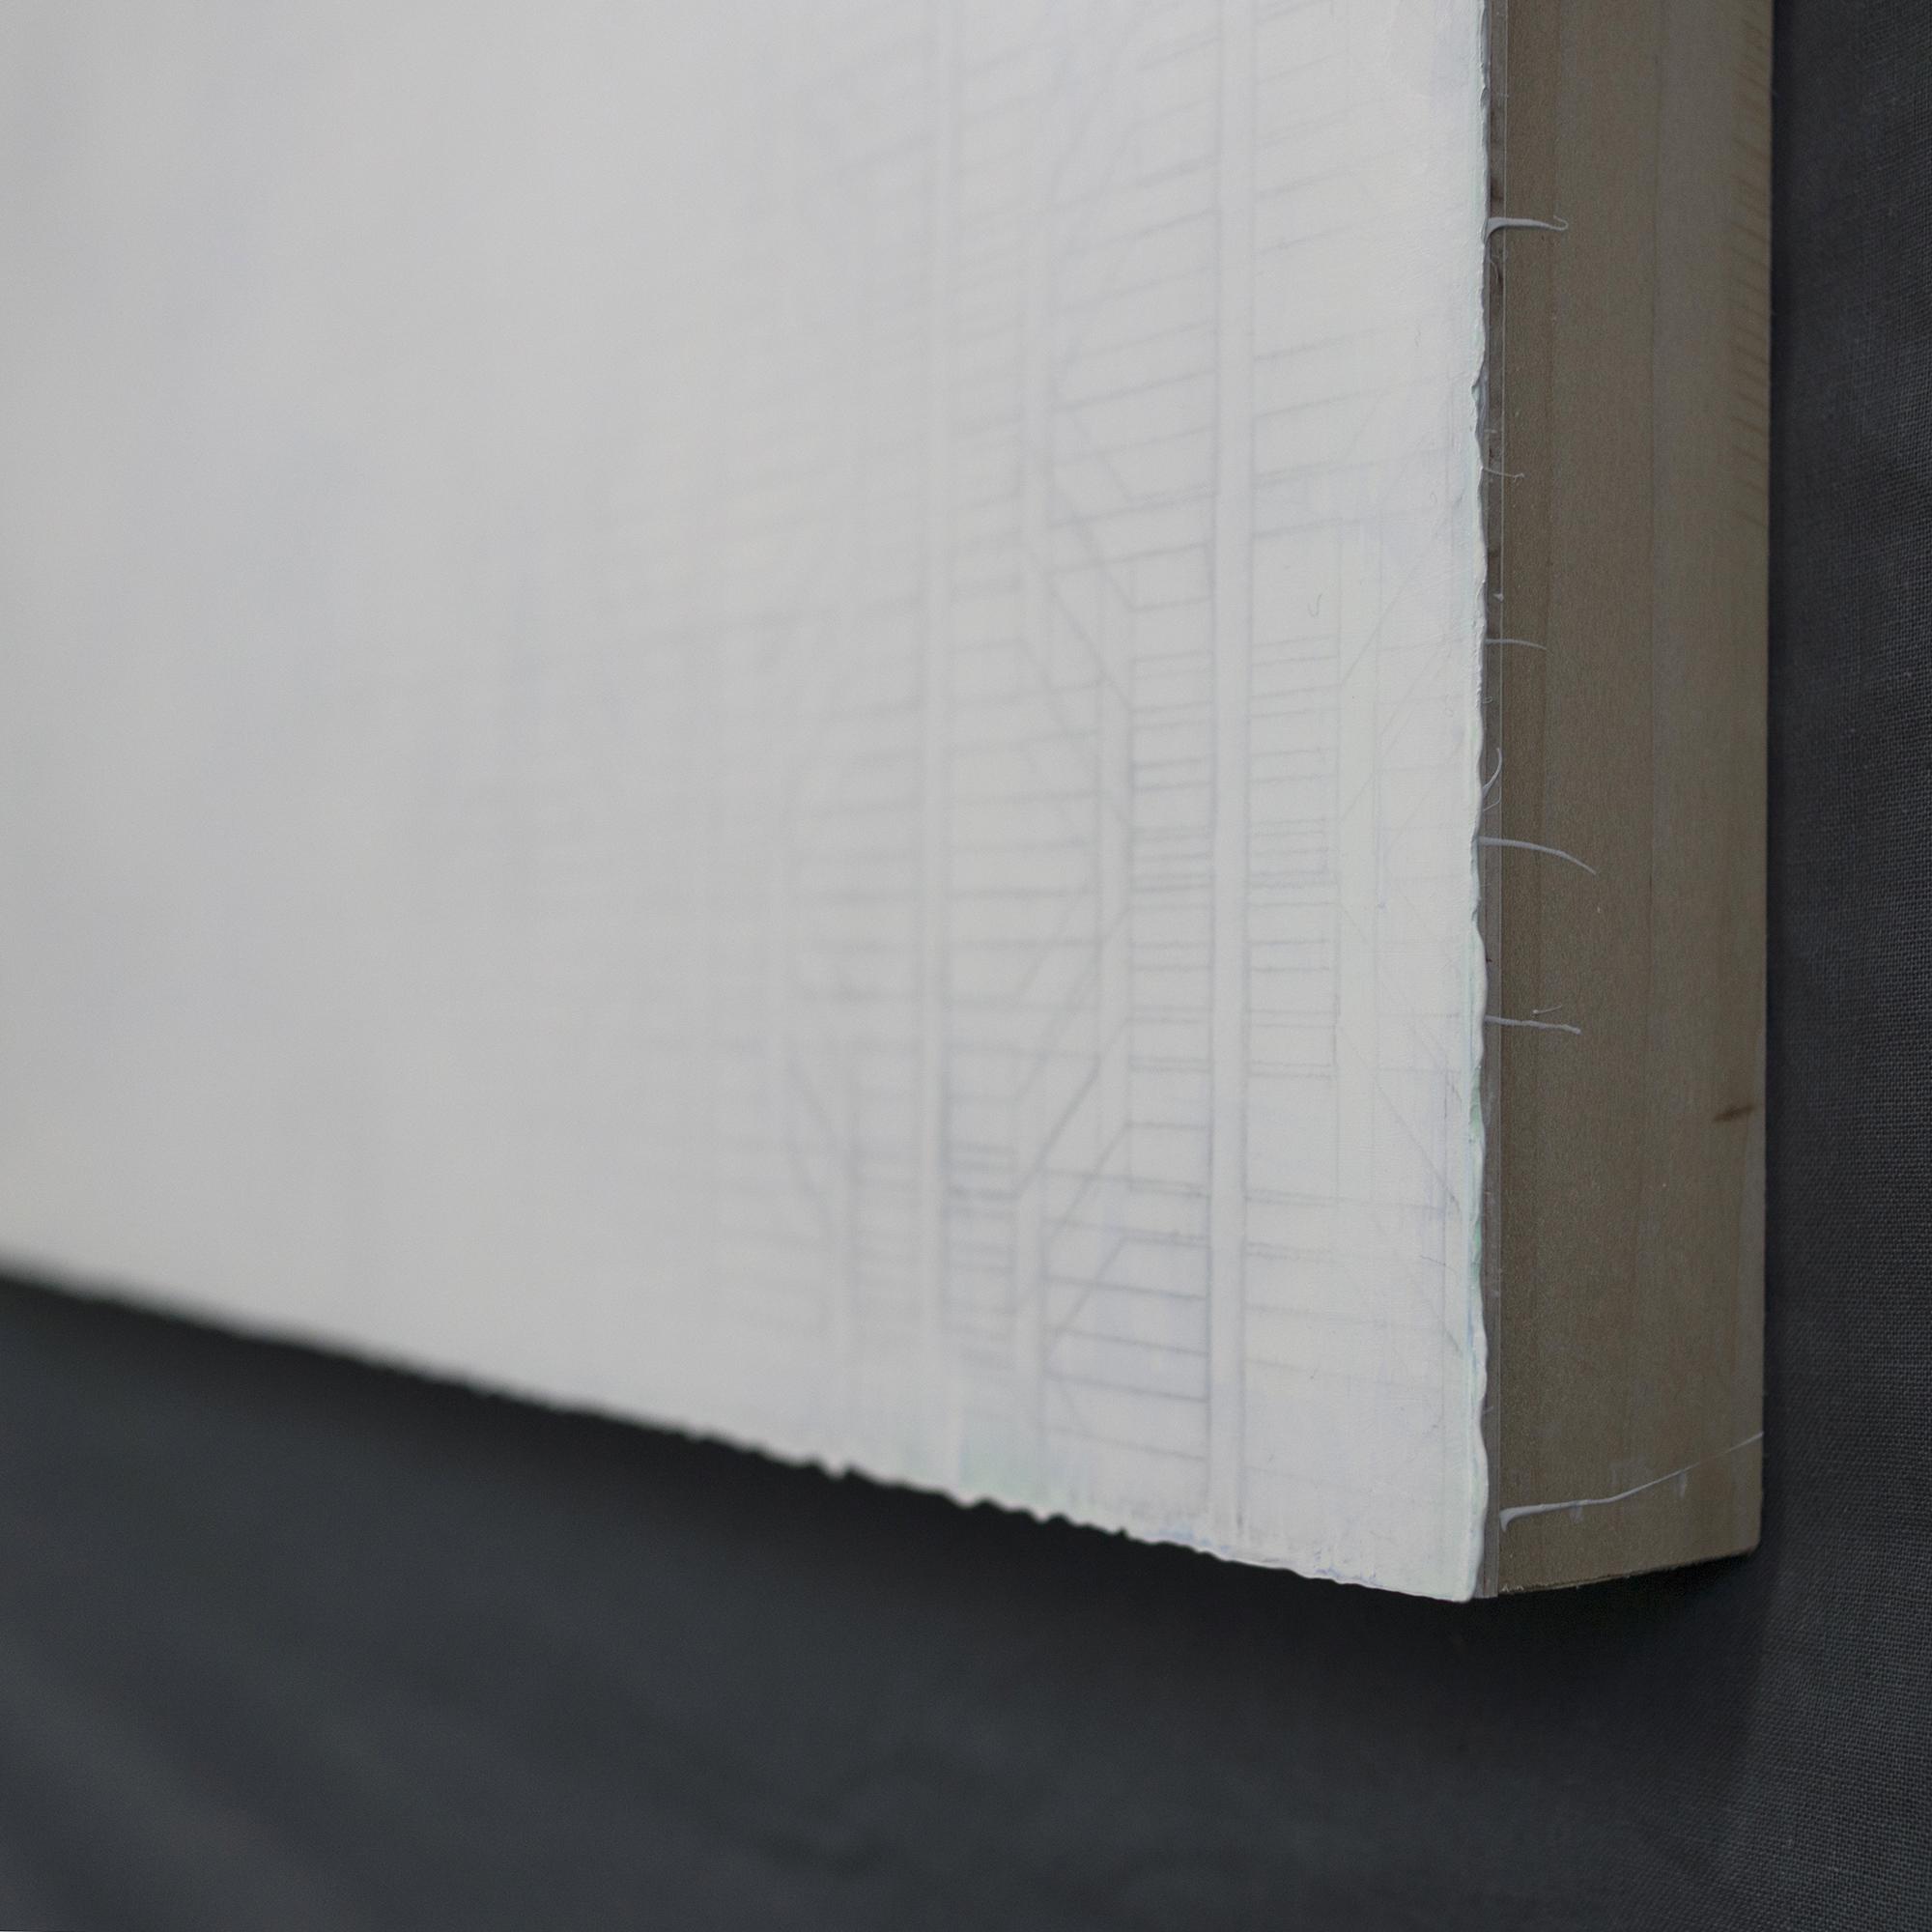 Detail (1 x 10 - 01)